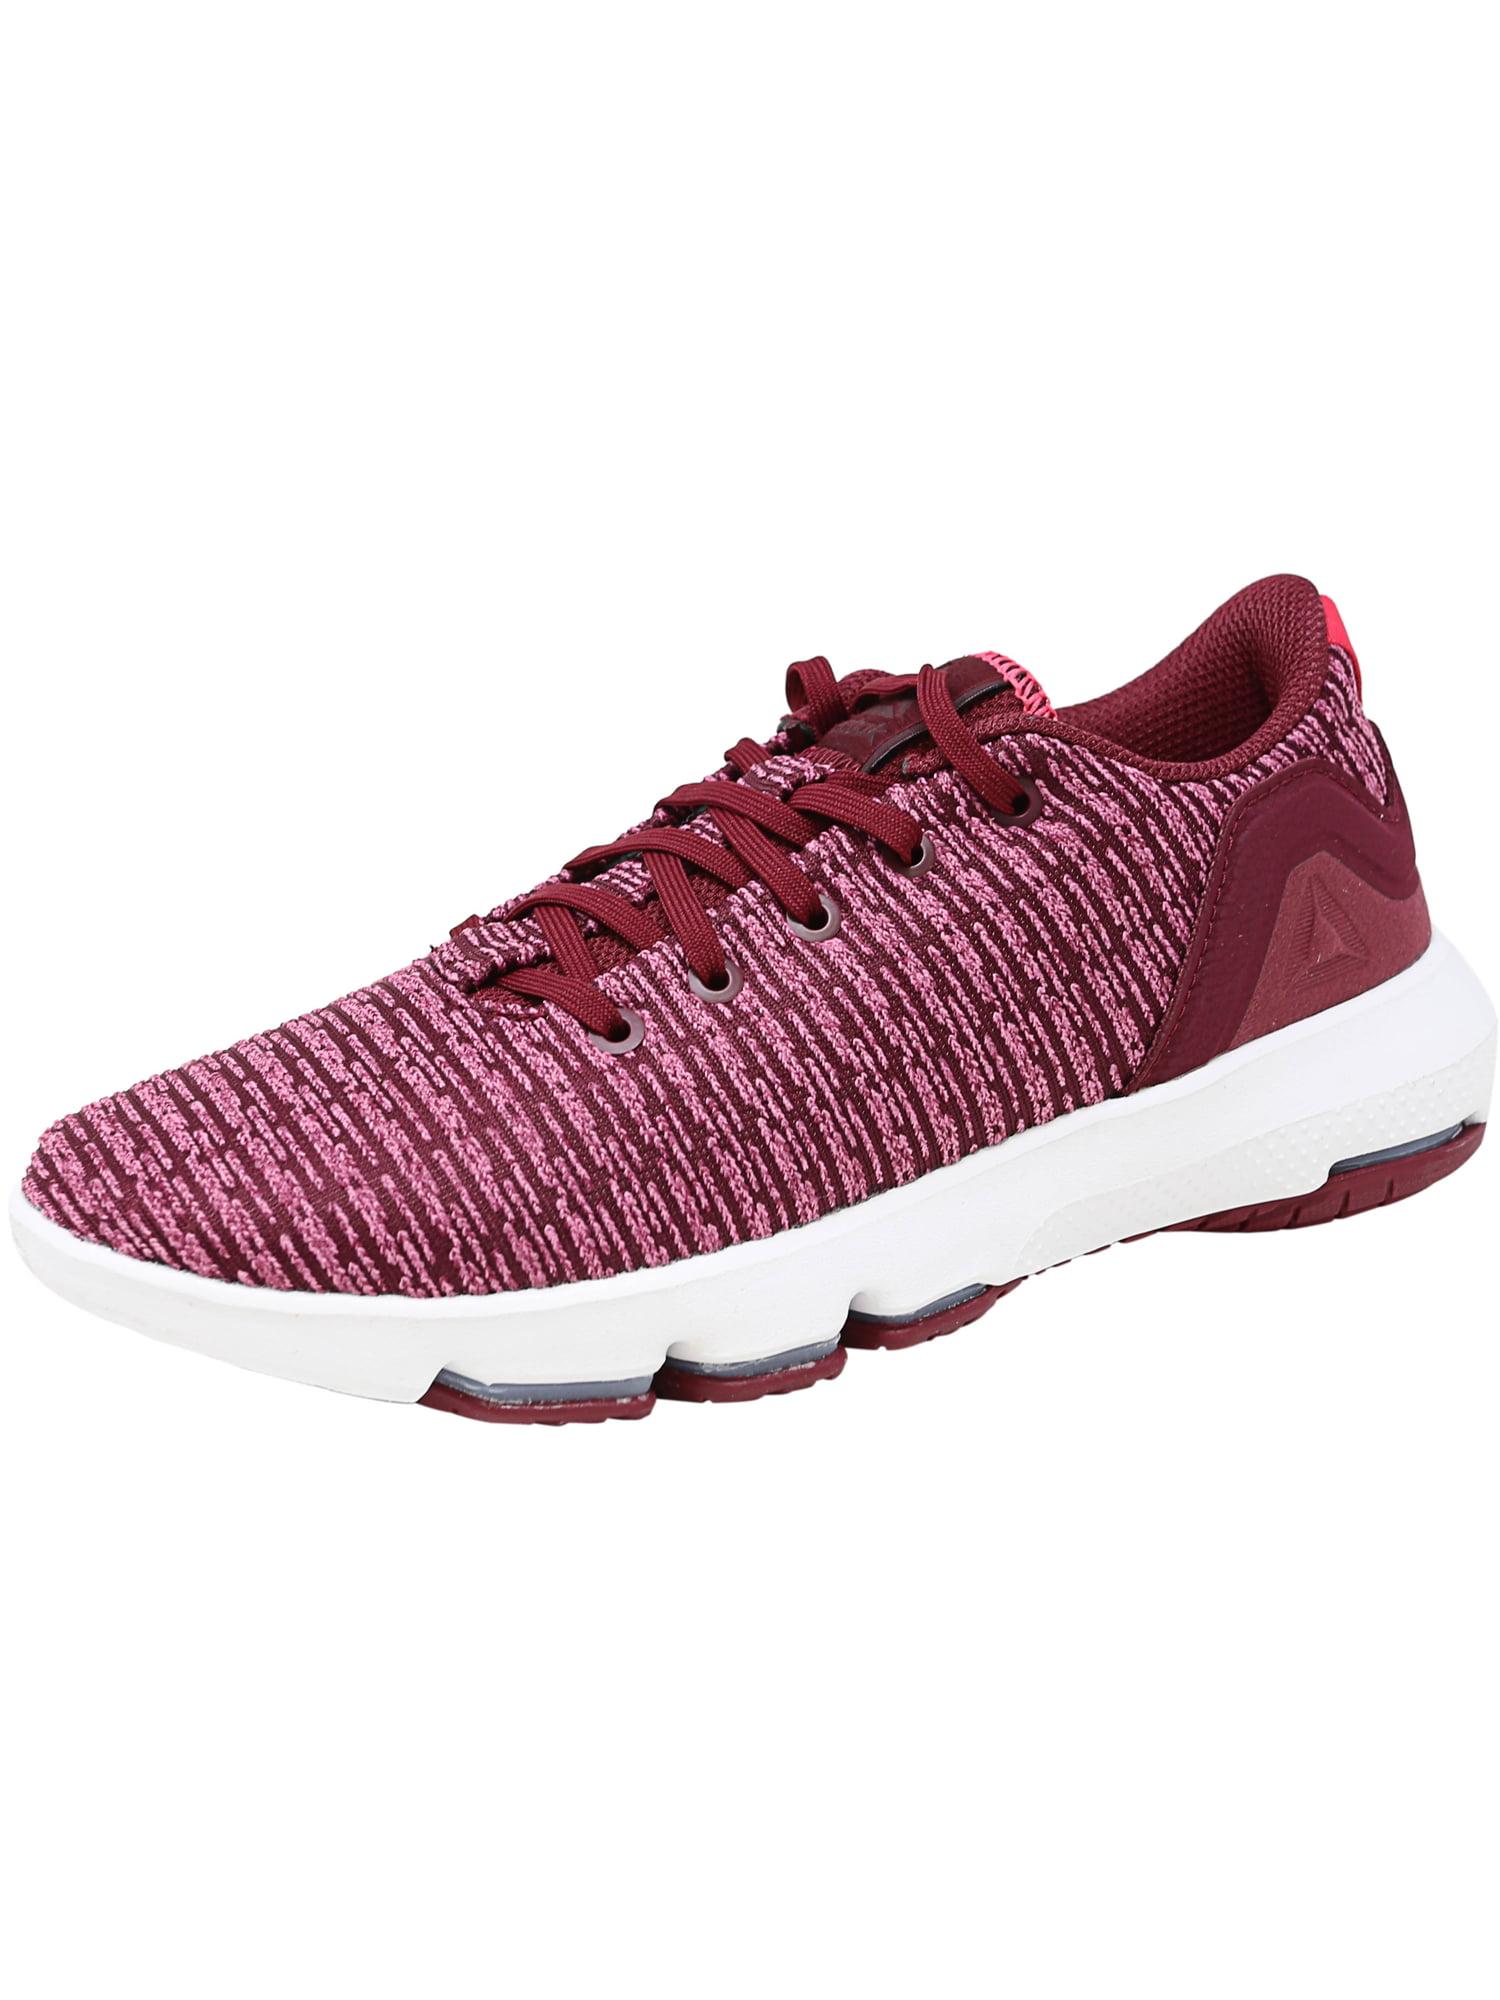 Reebok Women's Cloudride Dmx 3.0 Rustic Wine / Pink White Ankle-High Walking Shoe - 5.5M